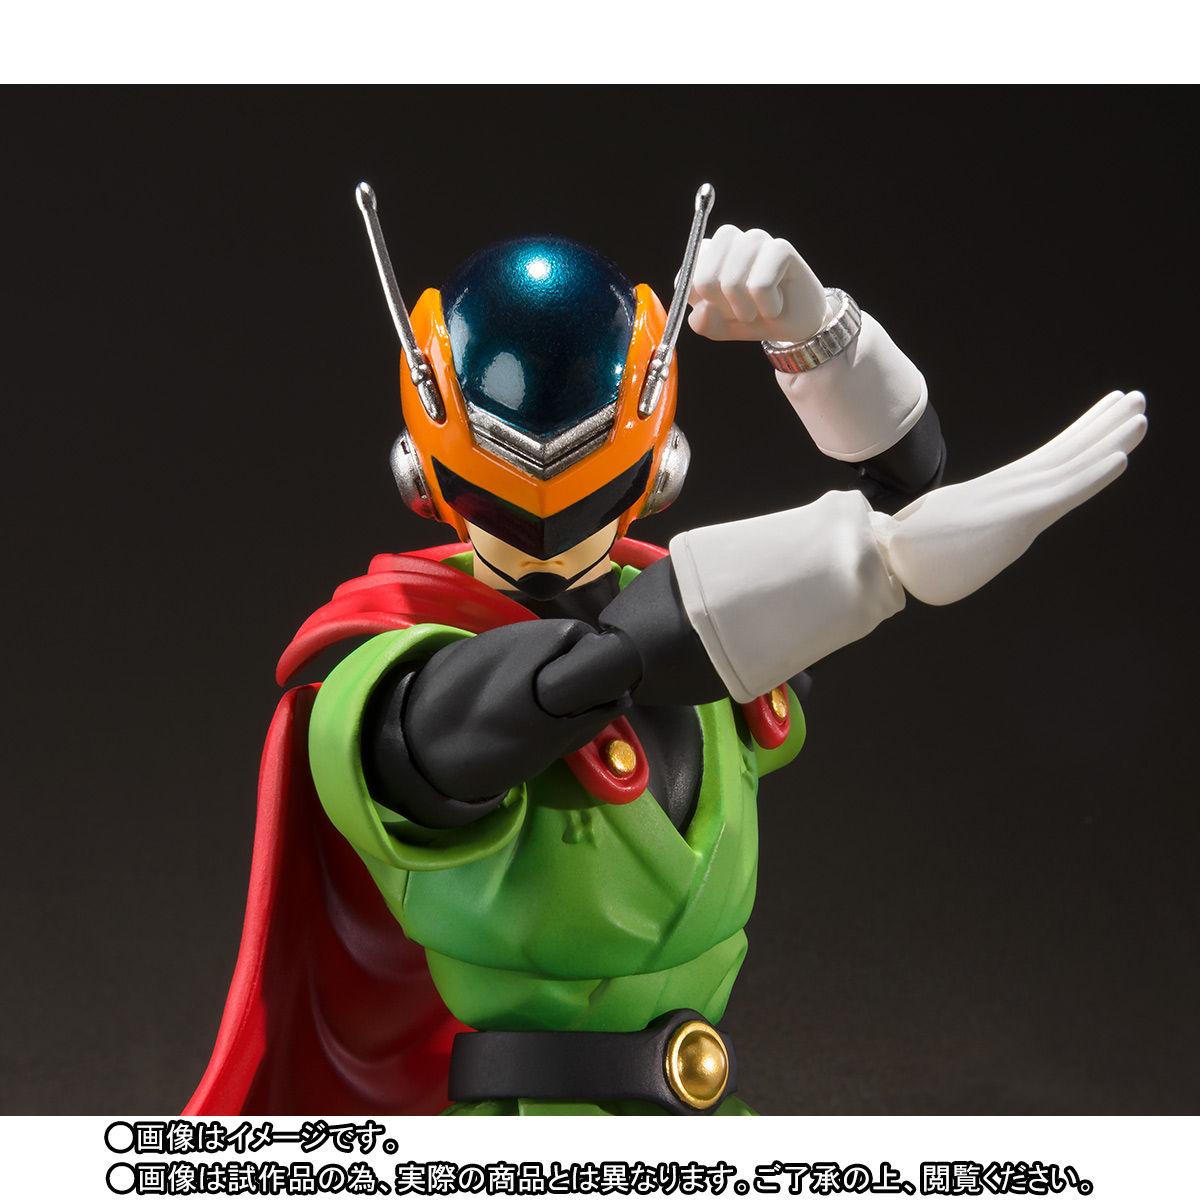 S.H.フィギュアーツ『グレートサイヤマン』ドラゴンボールZ 可動フィギュア-003